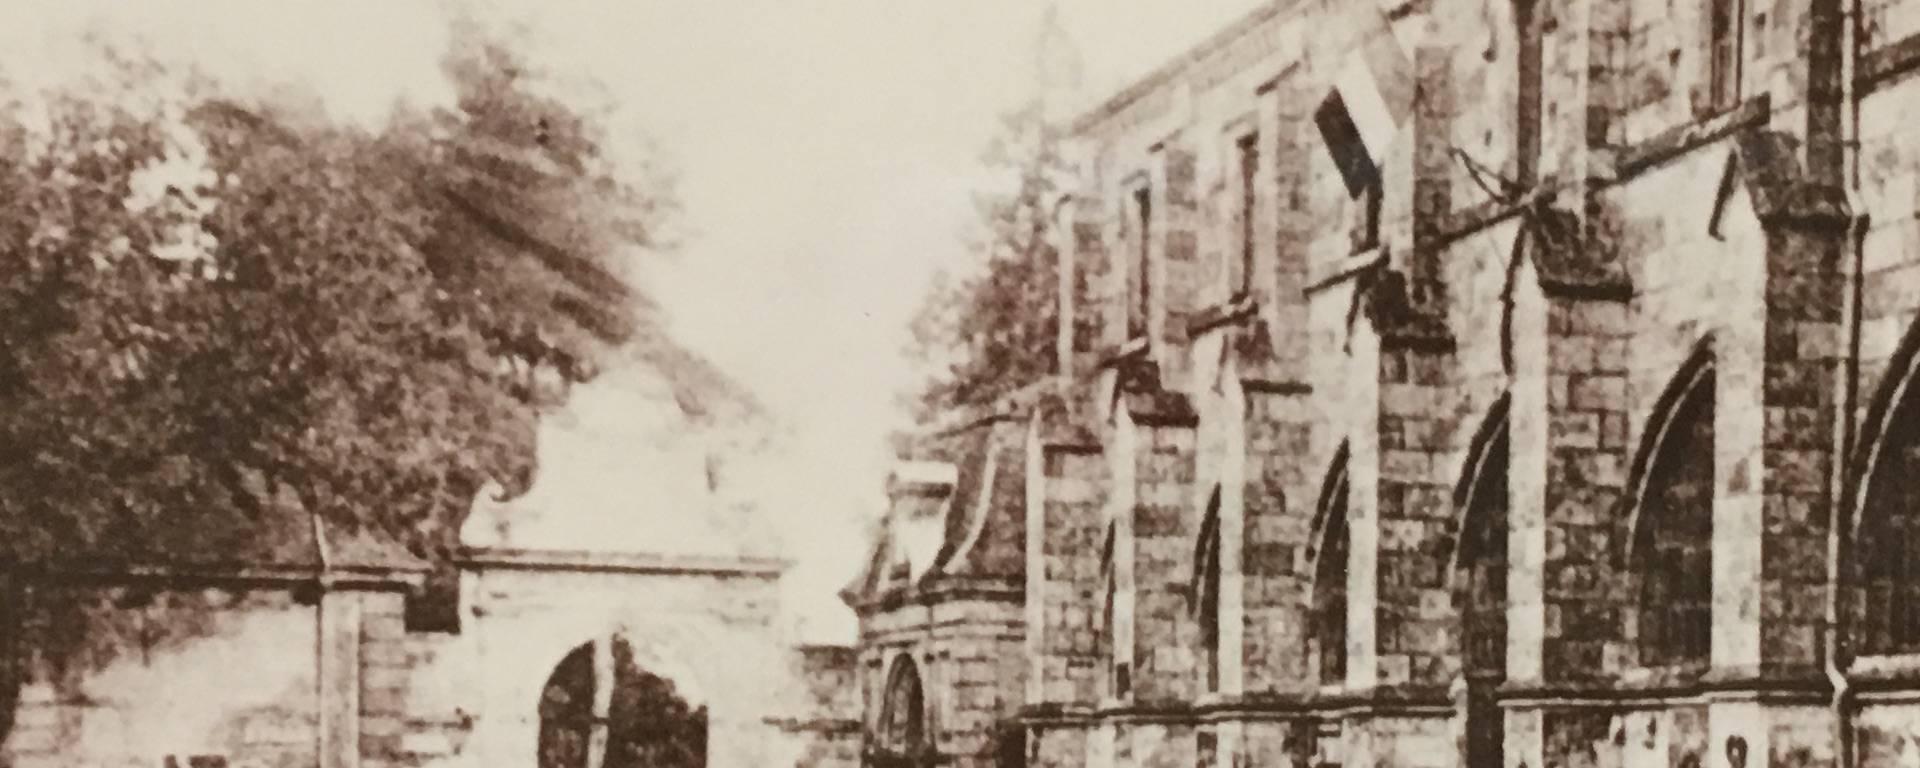 Former bishopric of Condom - old photo Fenestra